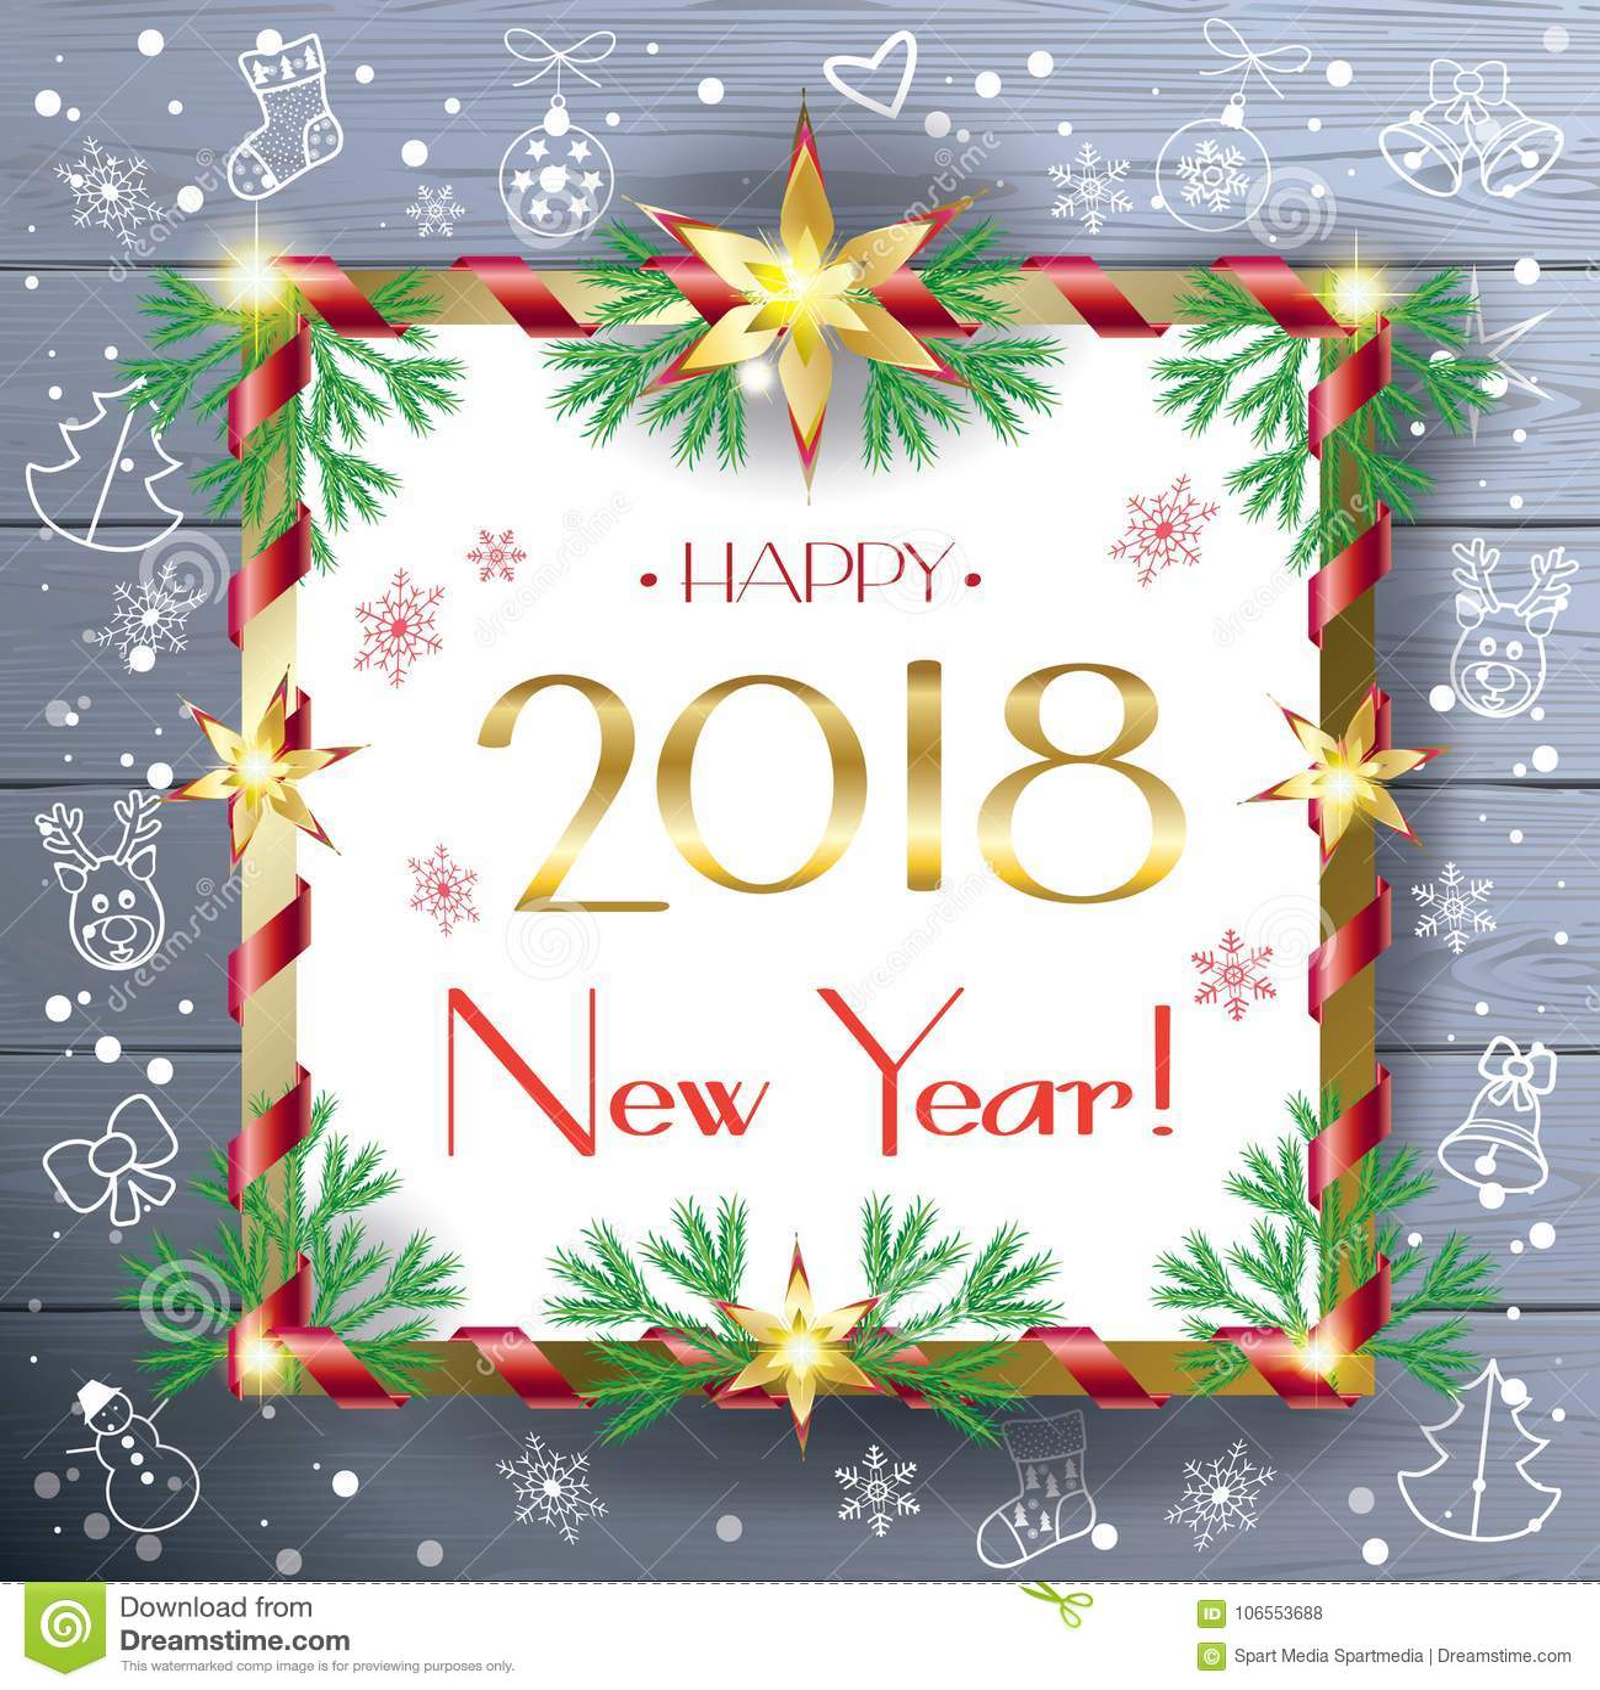 Christmas Gift Card Poster.2018 Holiday Christmas Greeting Poster Stock Vector